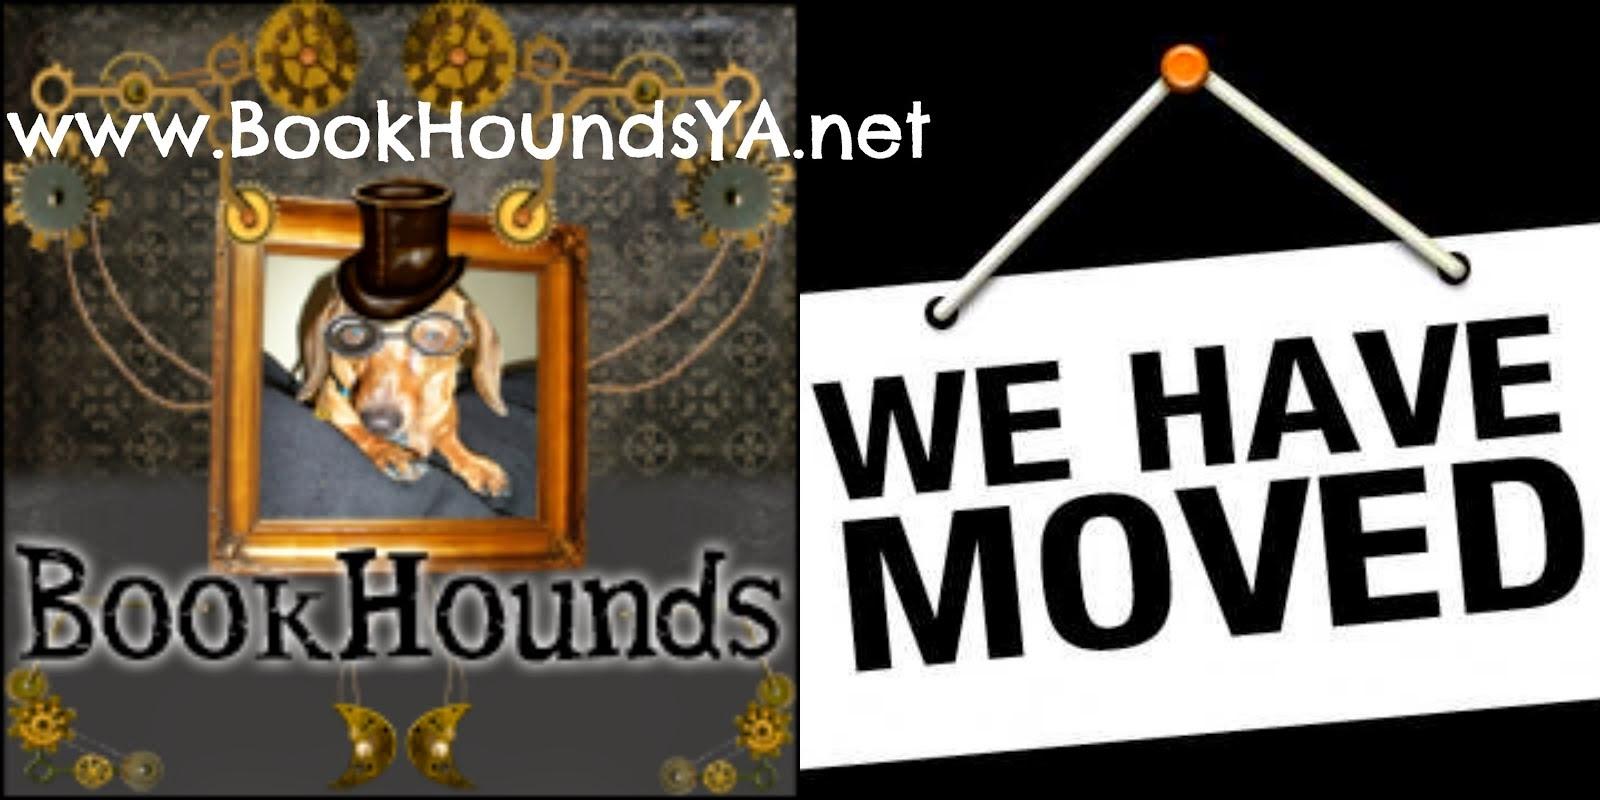 www.BookHoundsYA.net